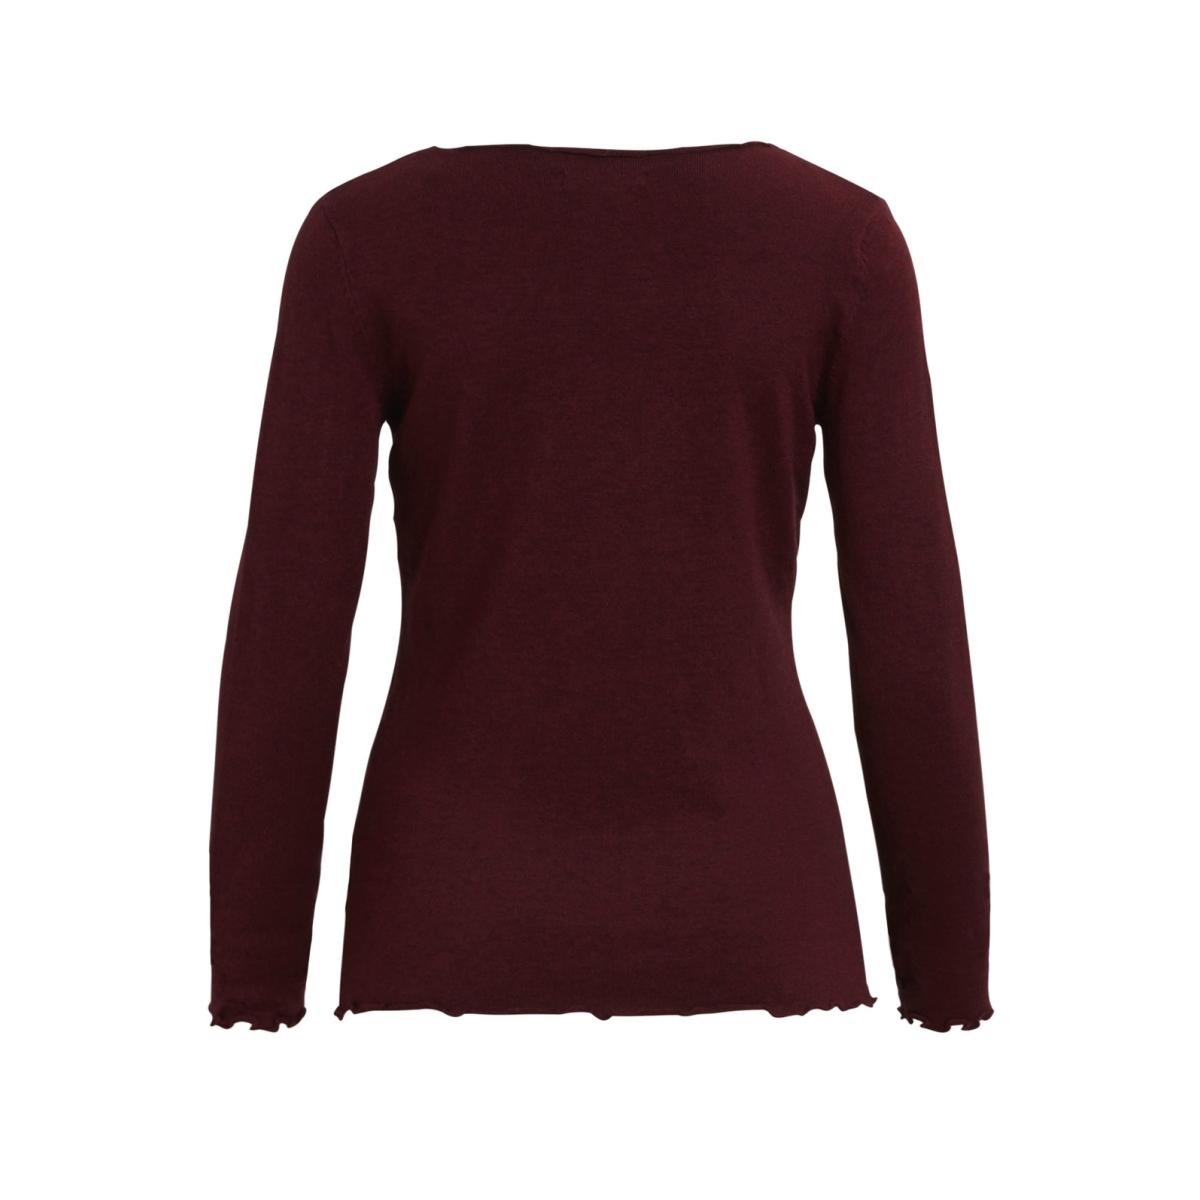 visabrine l/s  knit top 14042894 vila trui cabernet/black melange